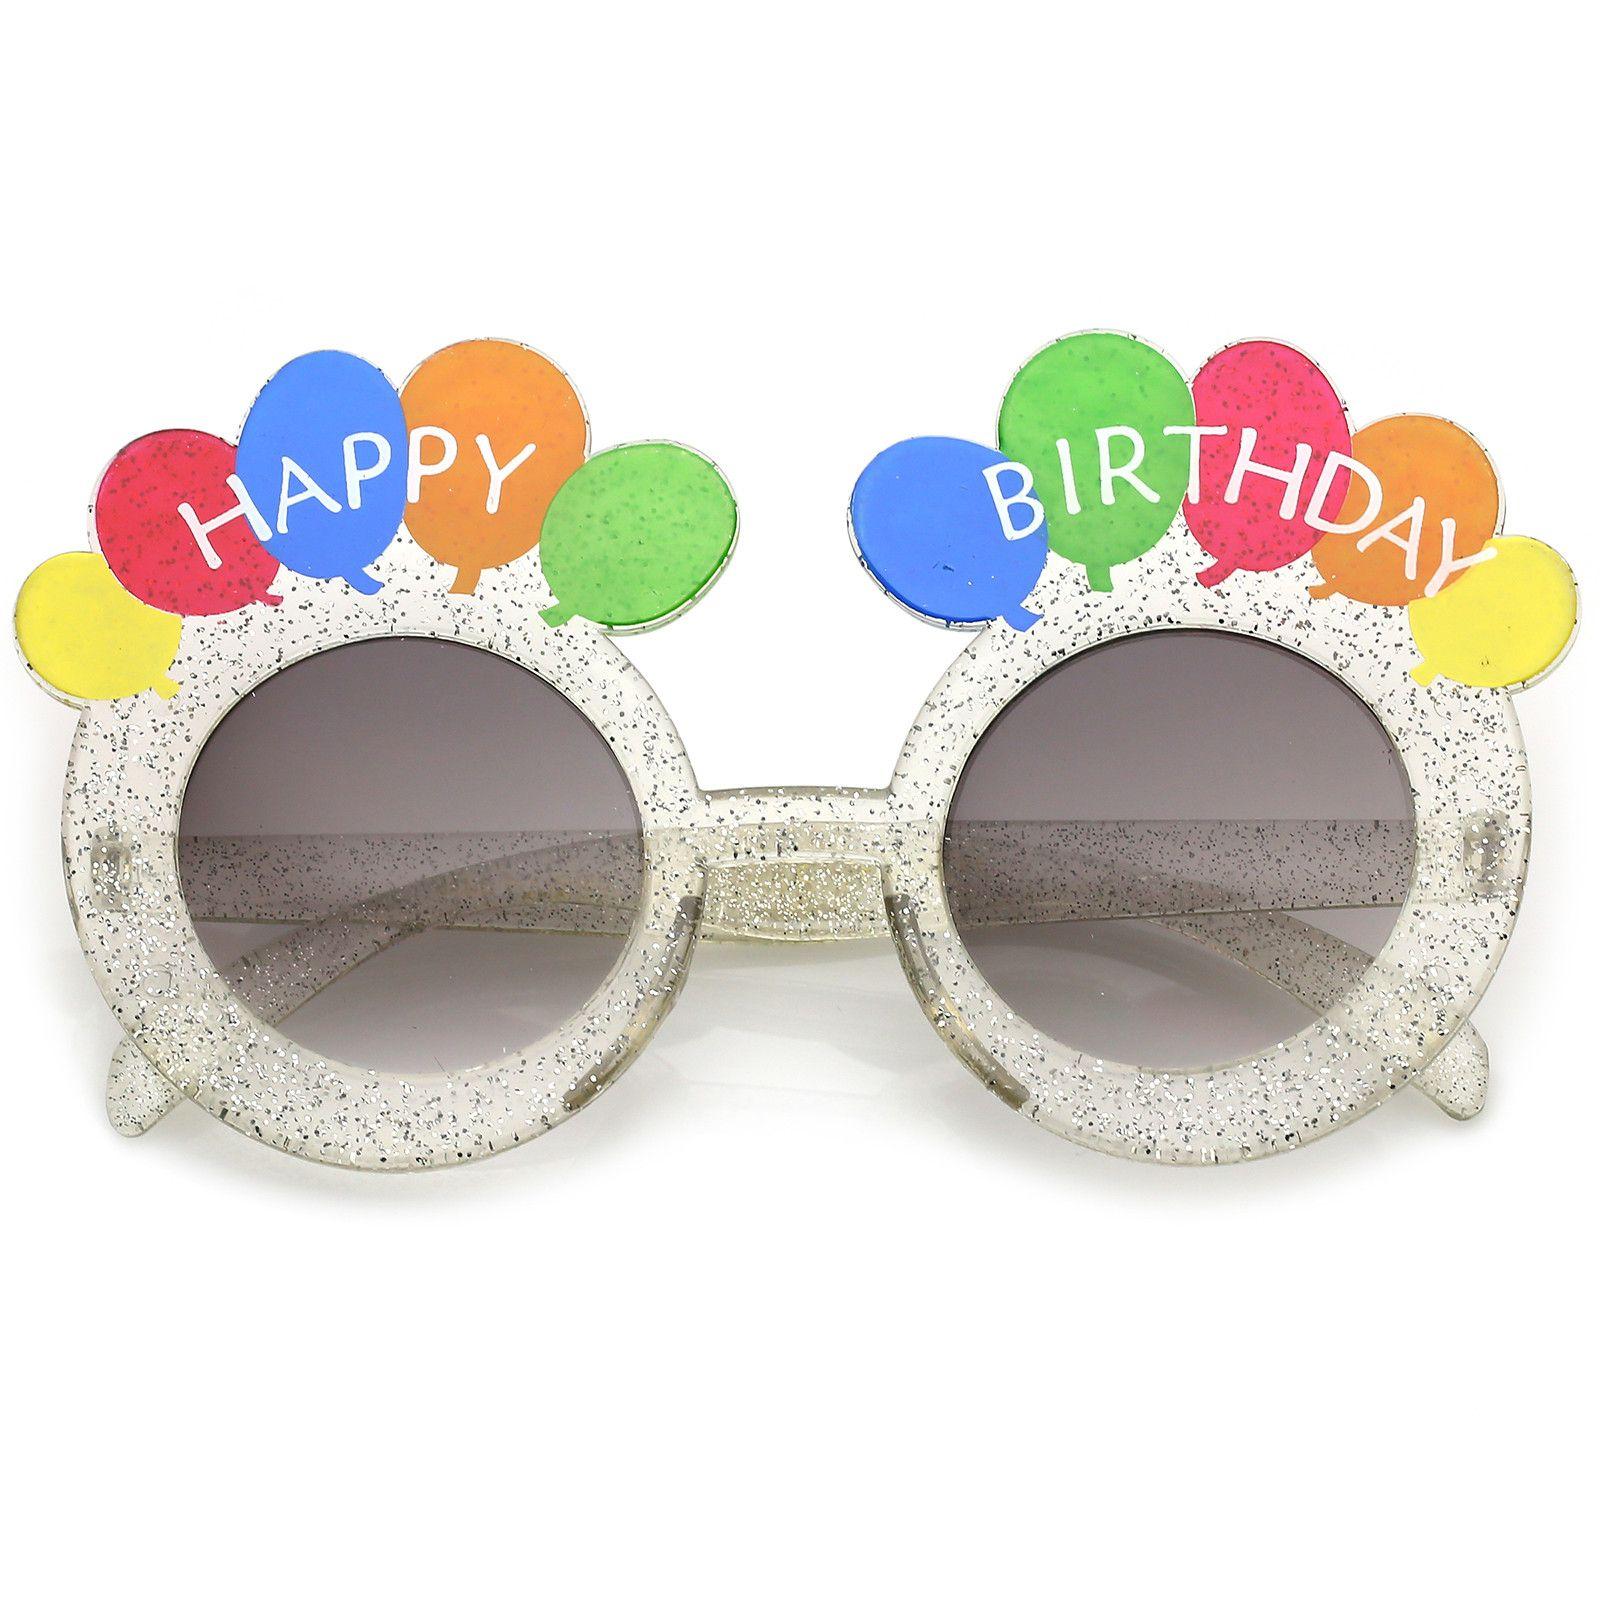 Novelty Translucent Glitter Happy Birthday Glasses With Balloons ...